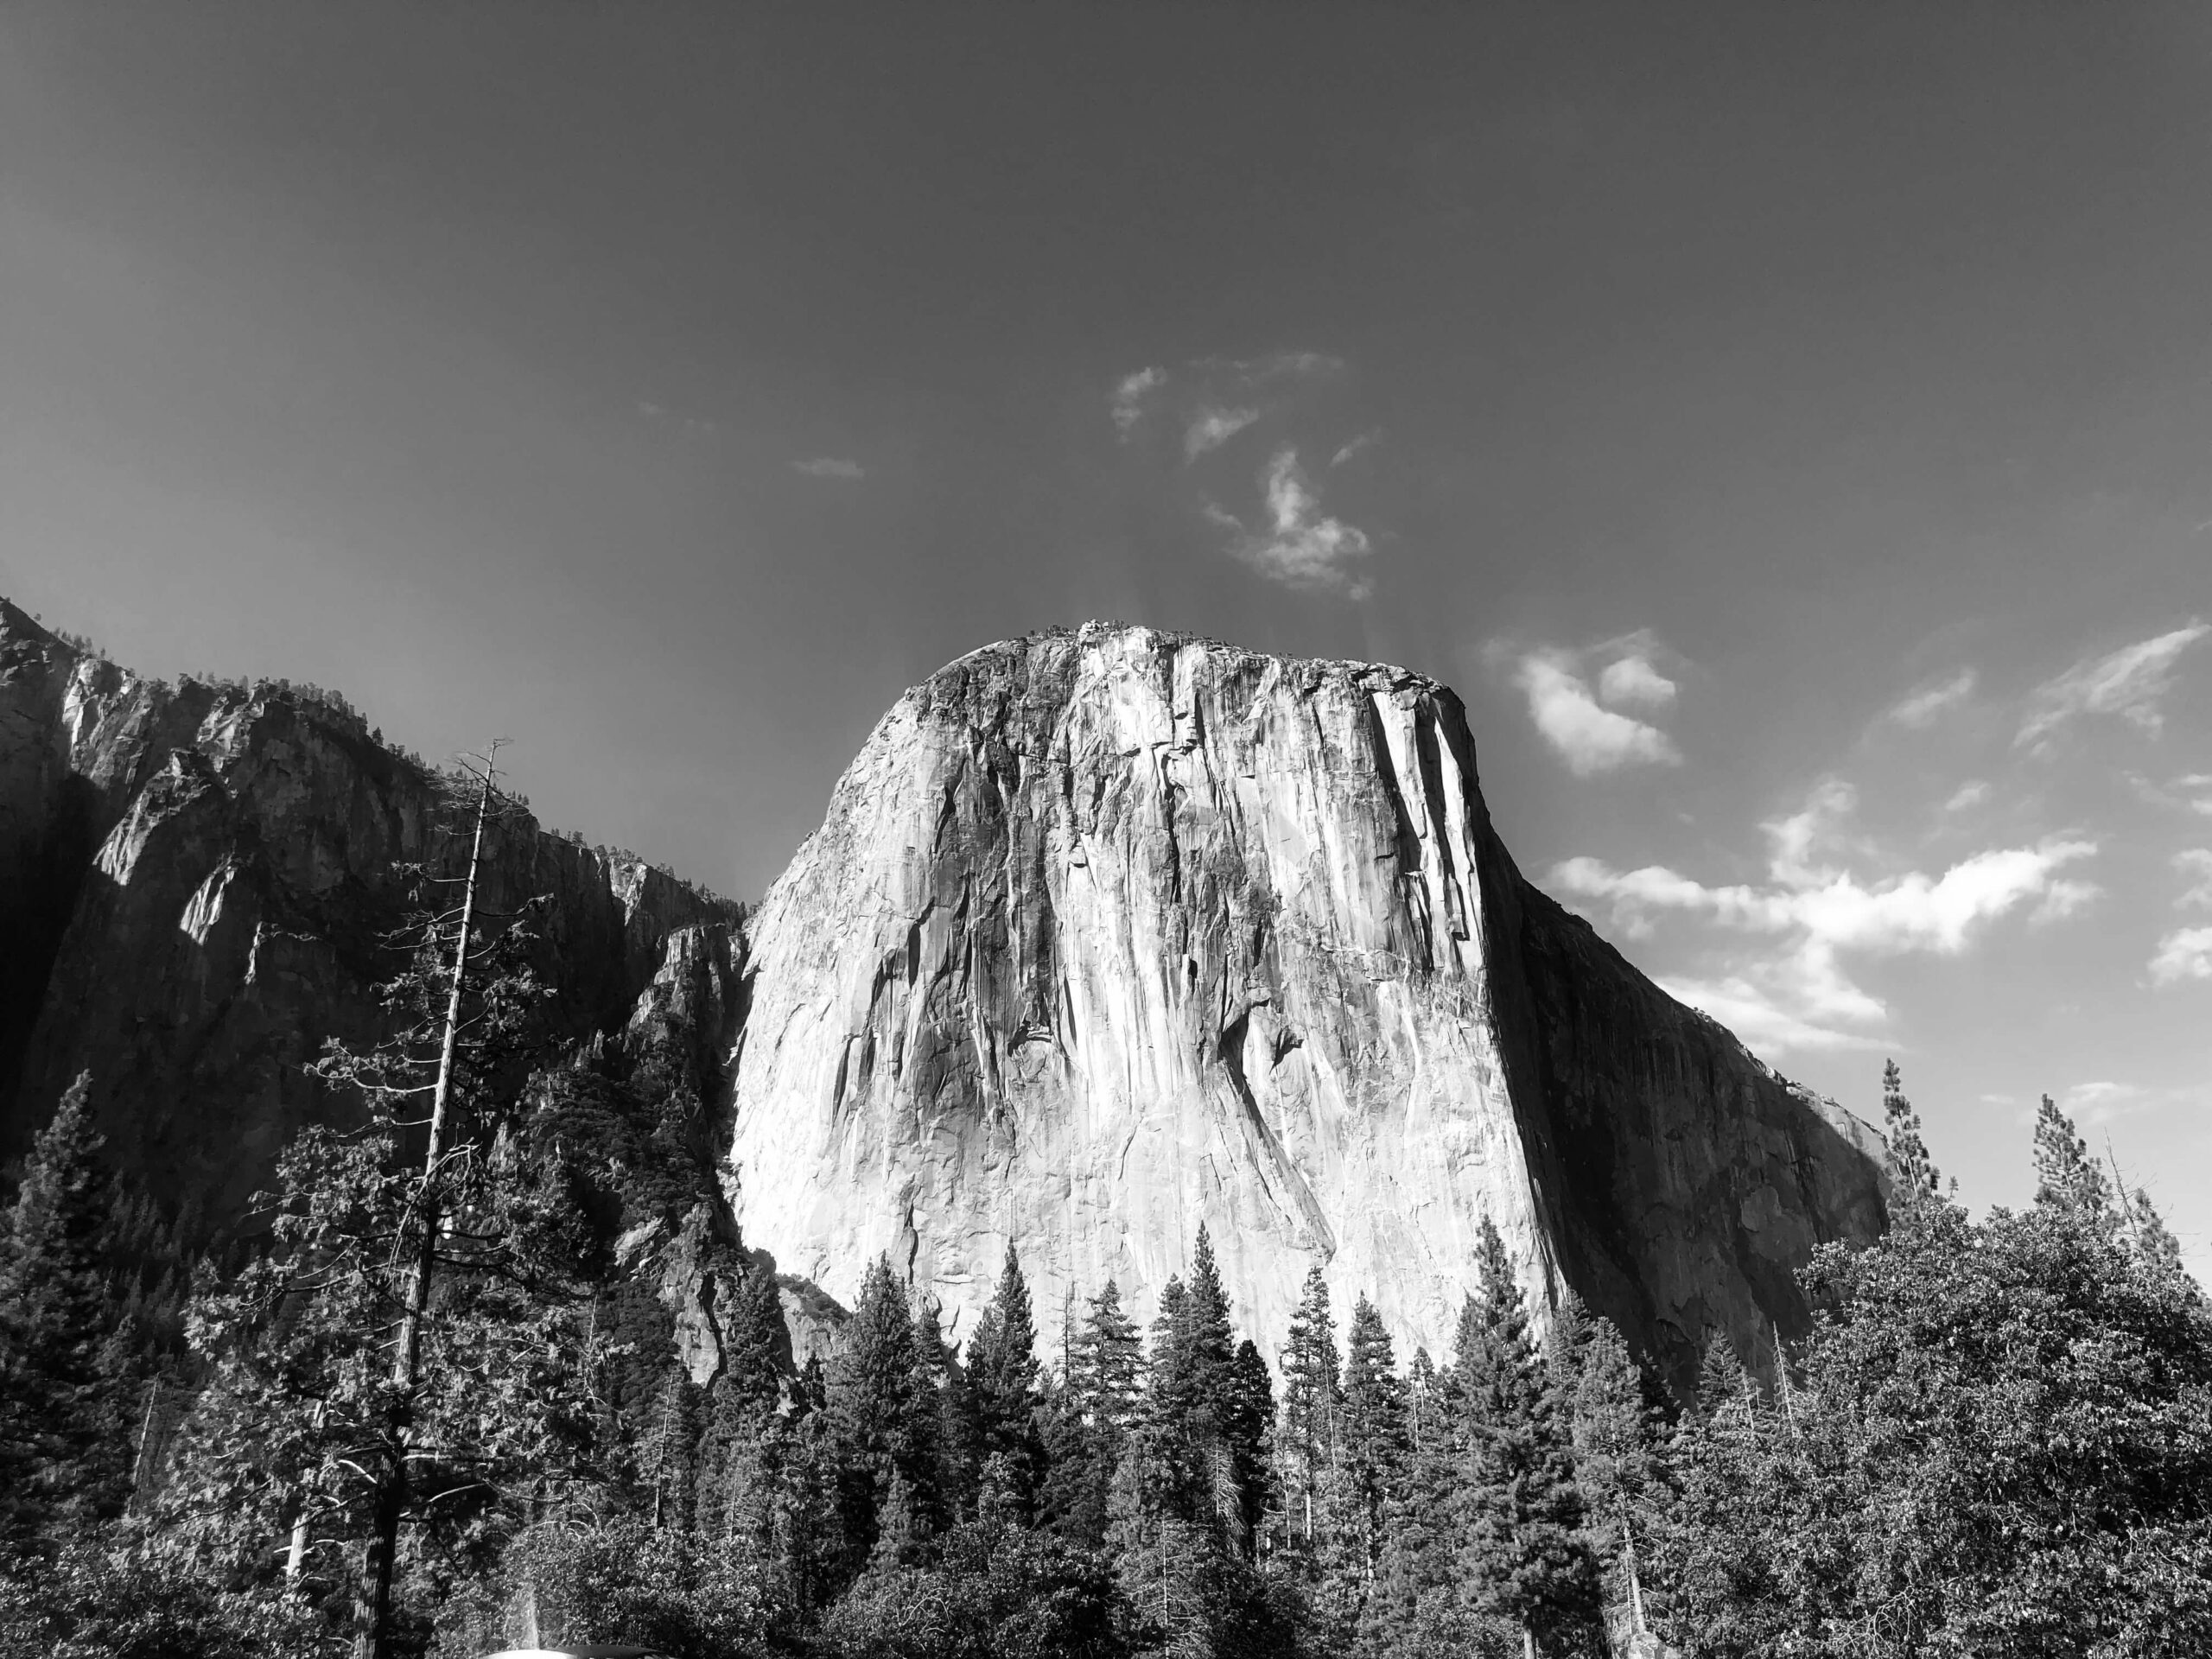 Yosemite National Park history